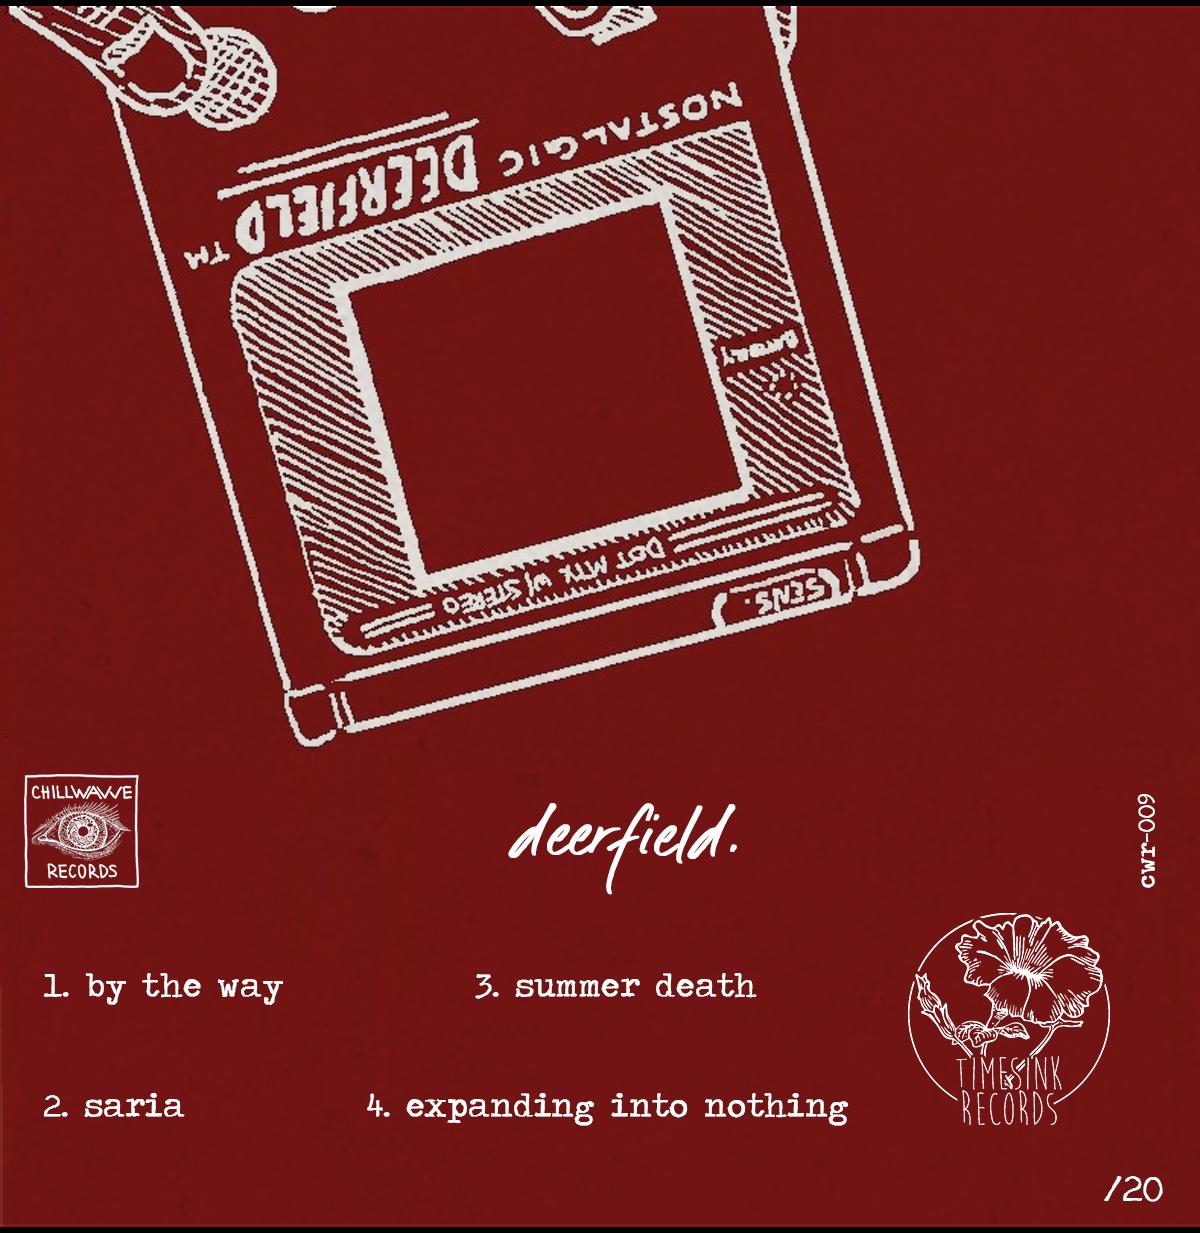 deerfield. - nostalgia - Tape